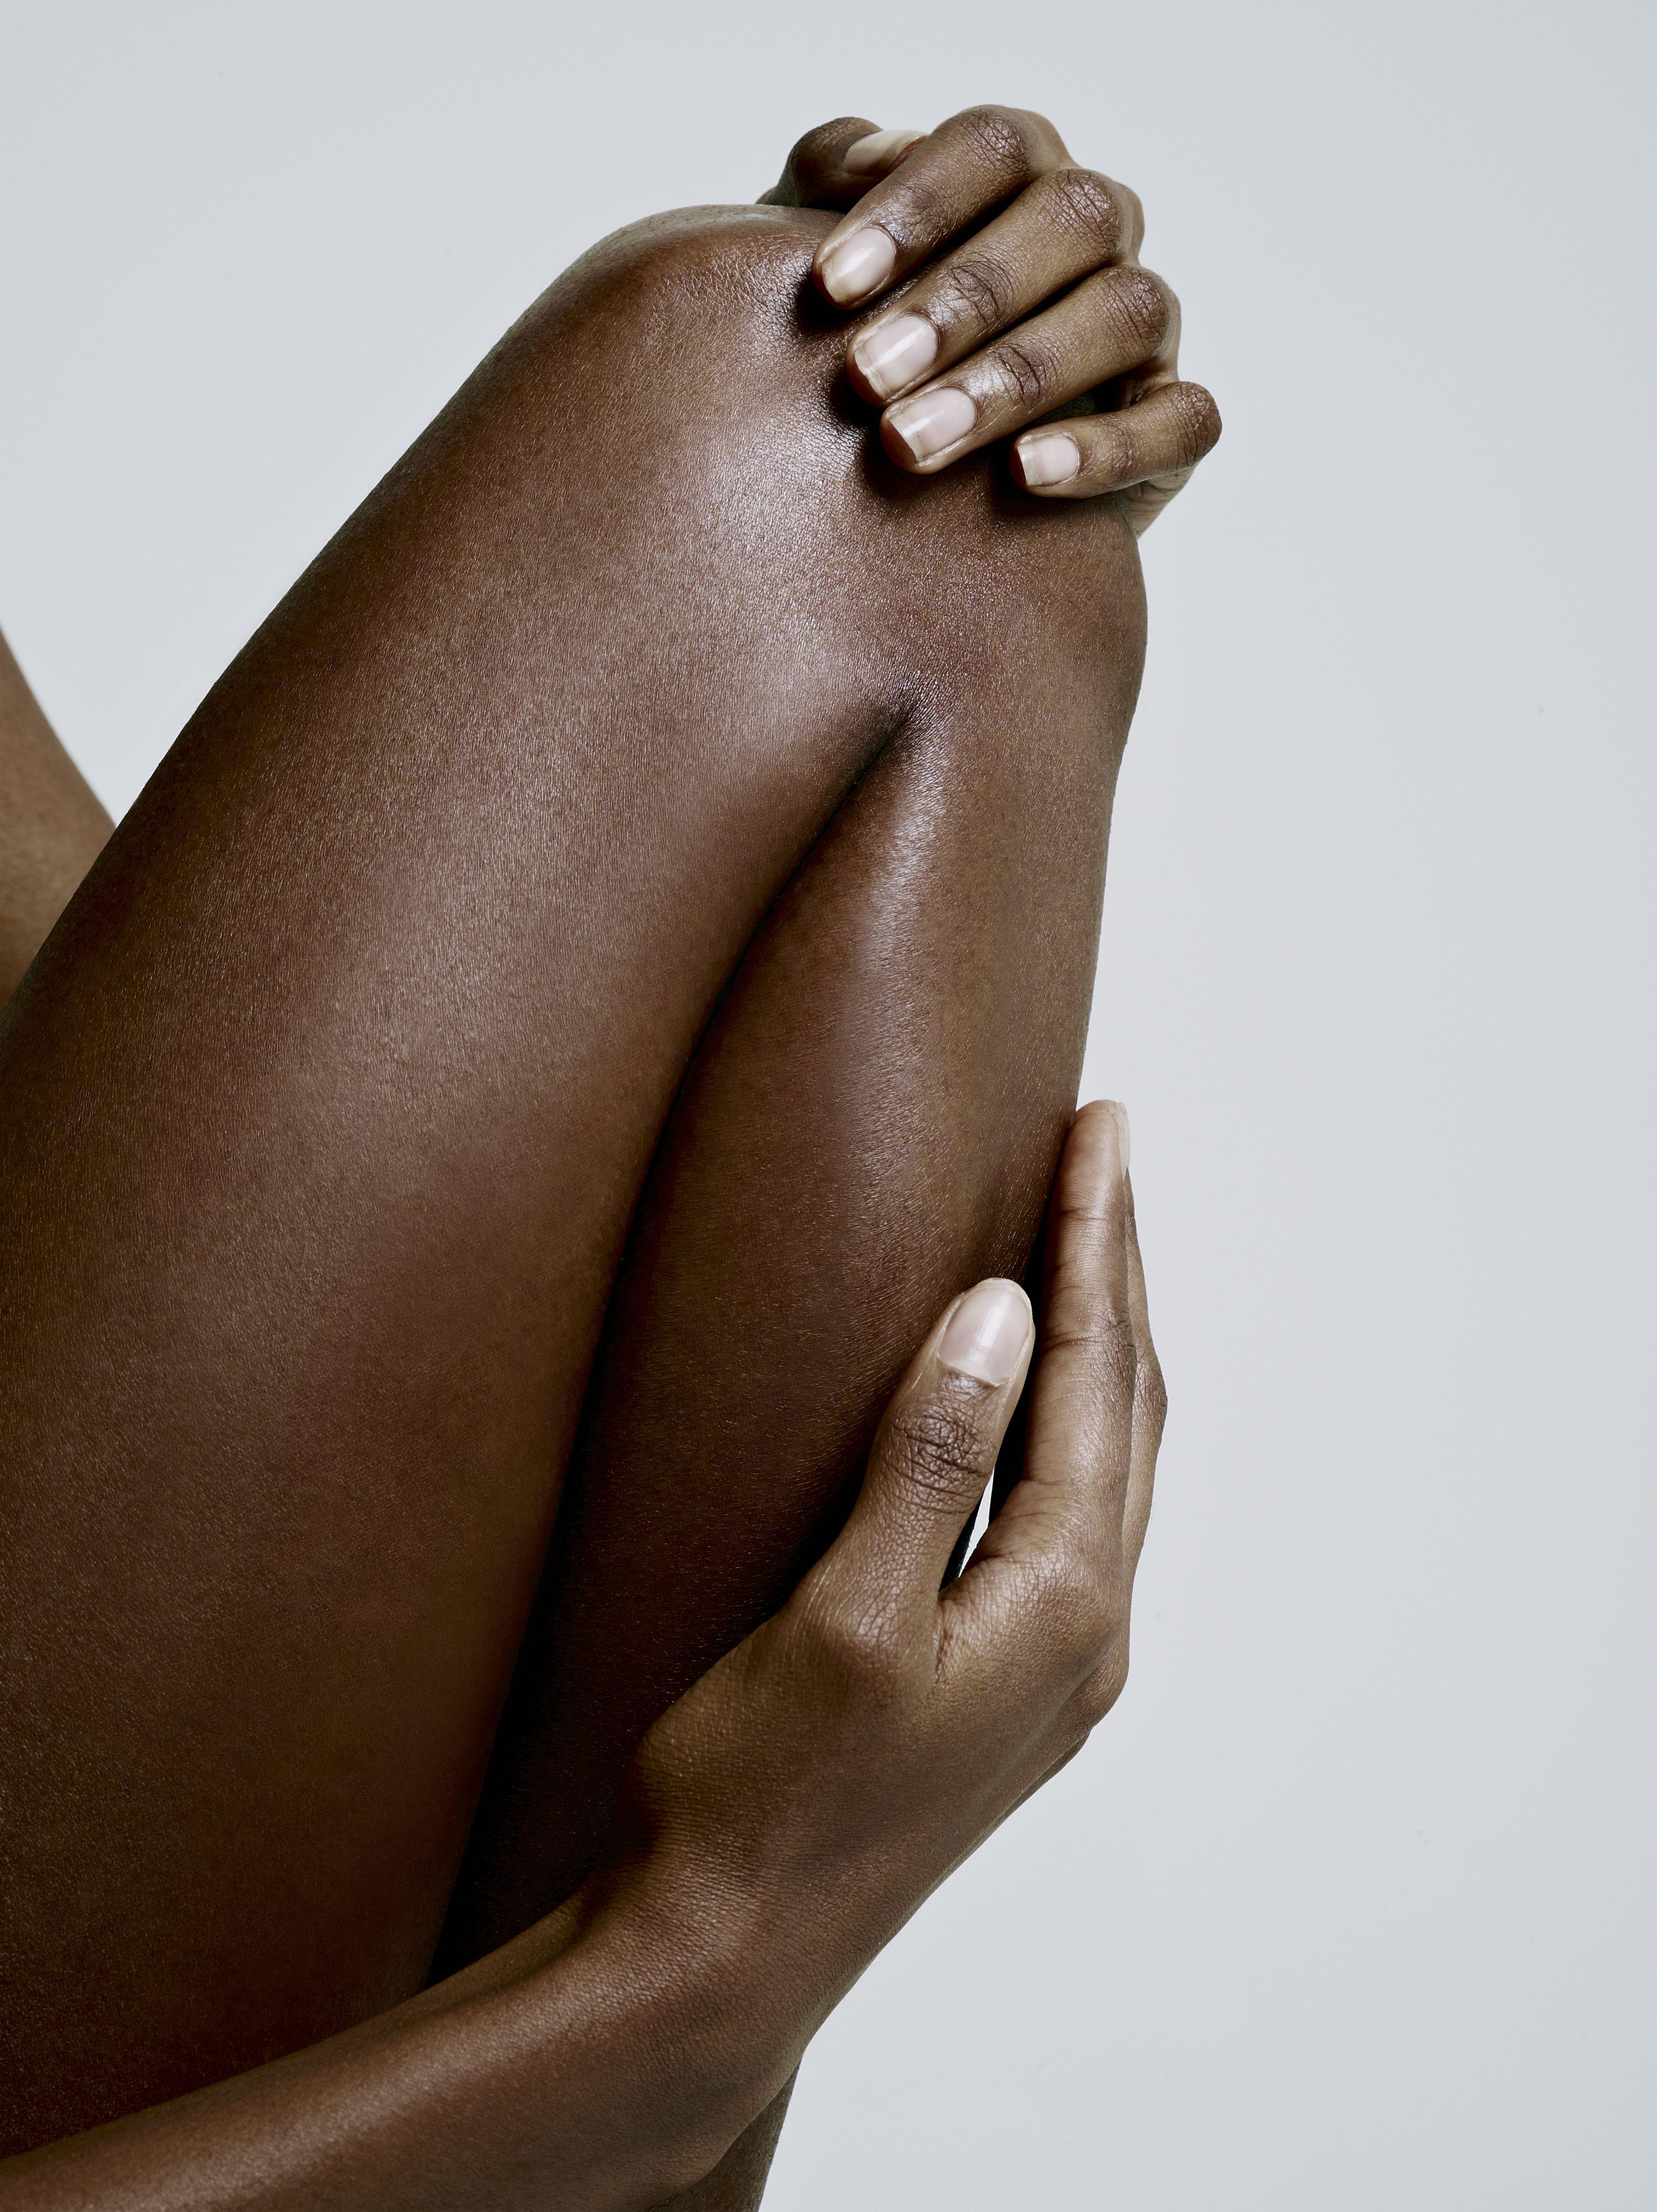 Bumps razor Razor Bumps: